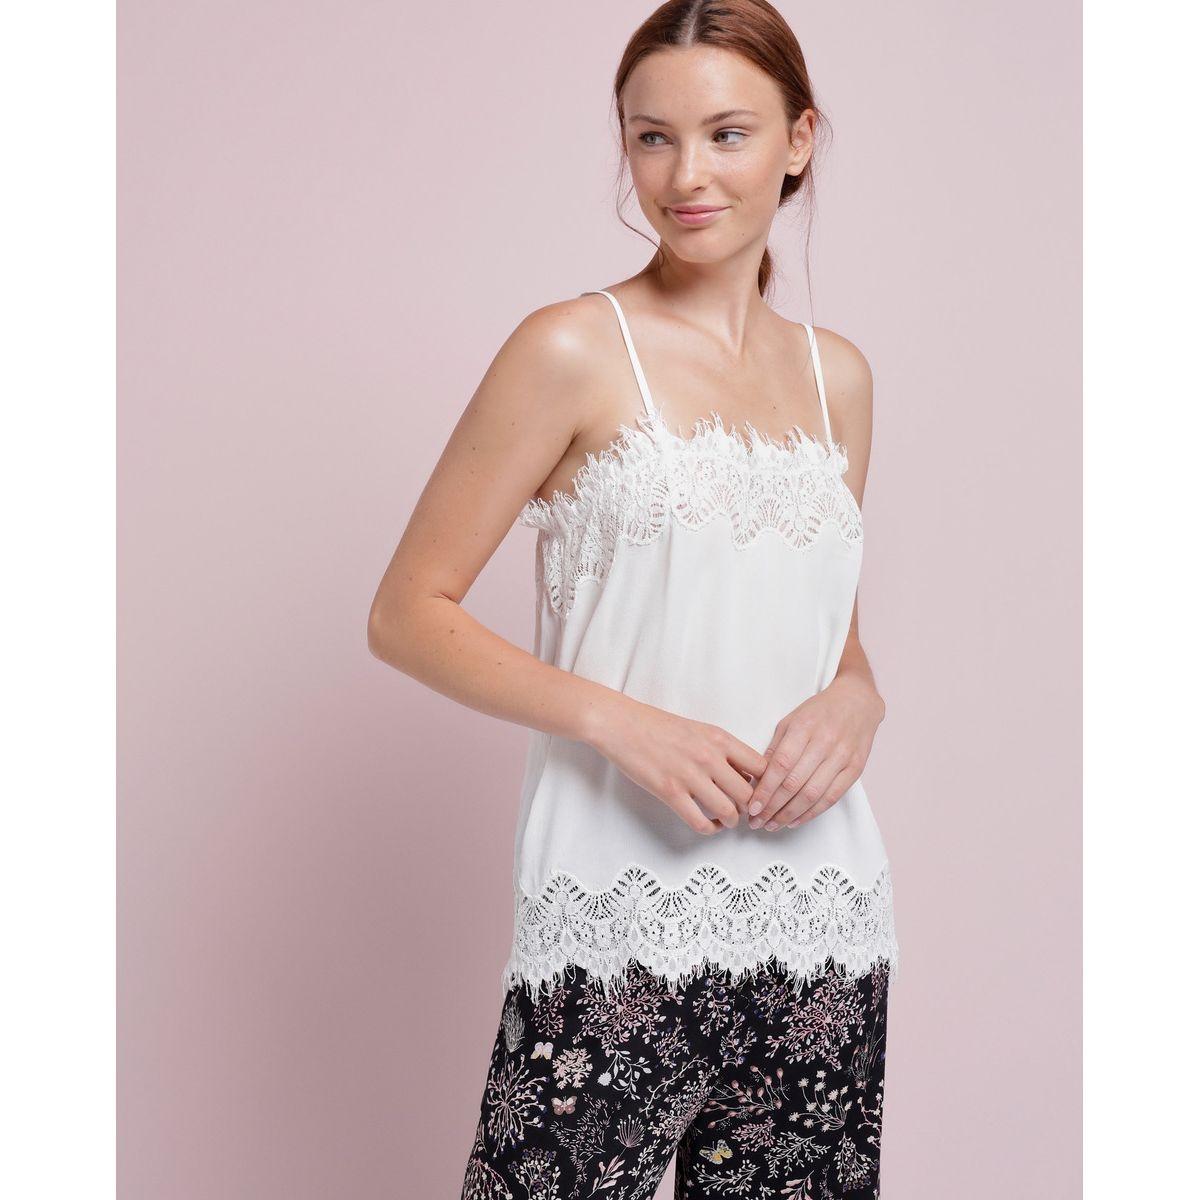 Top style lingerie Southern Cotton 100 % coton